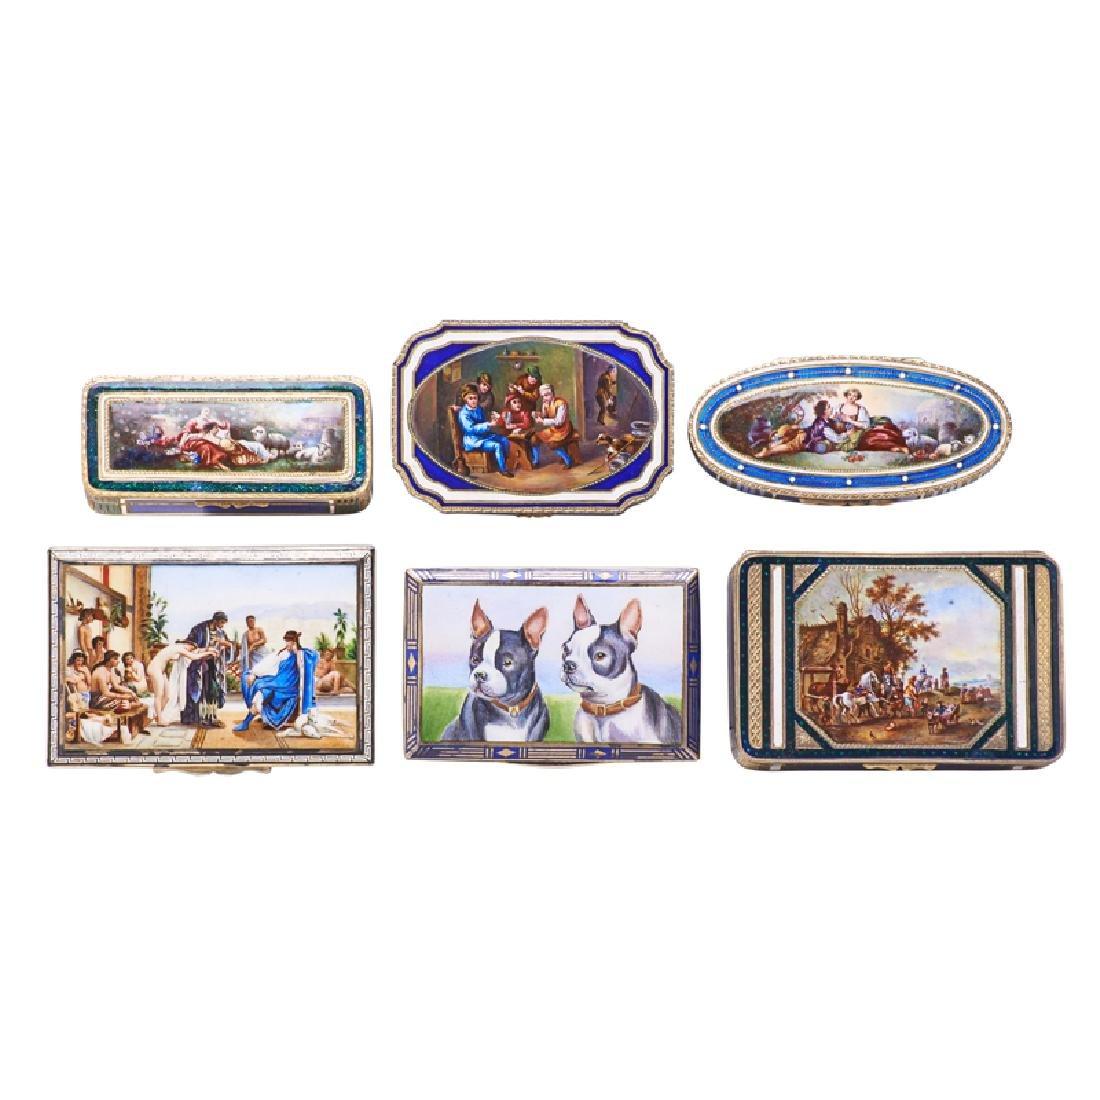 ENAMEL PARCEL-GILT SILVER BOXES